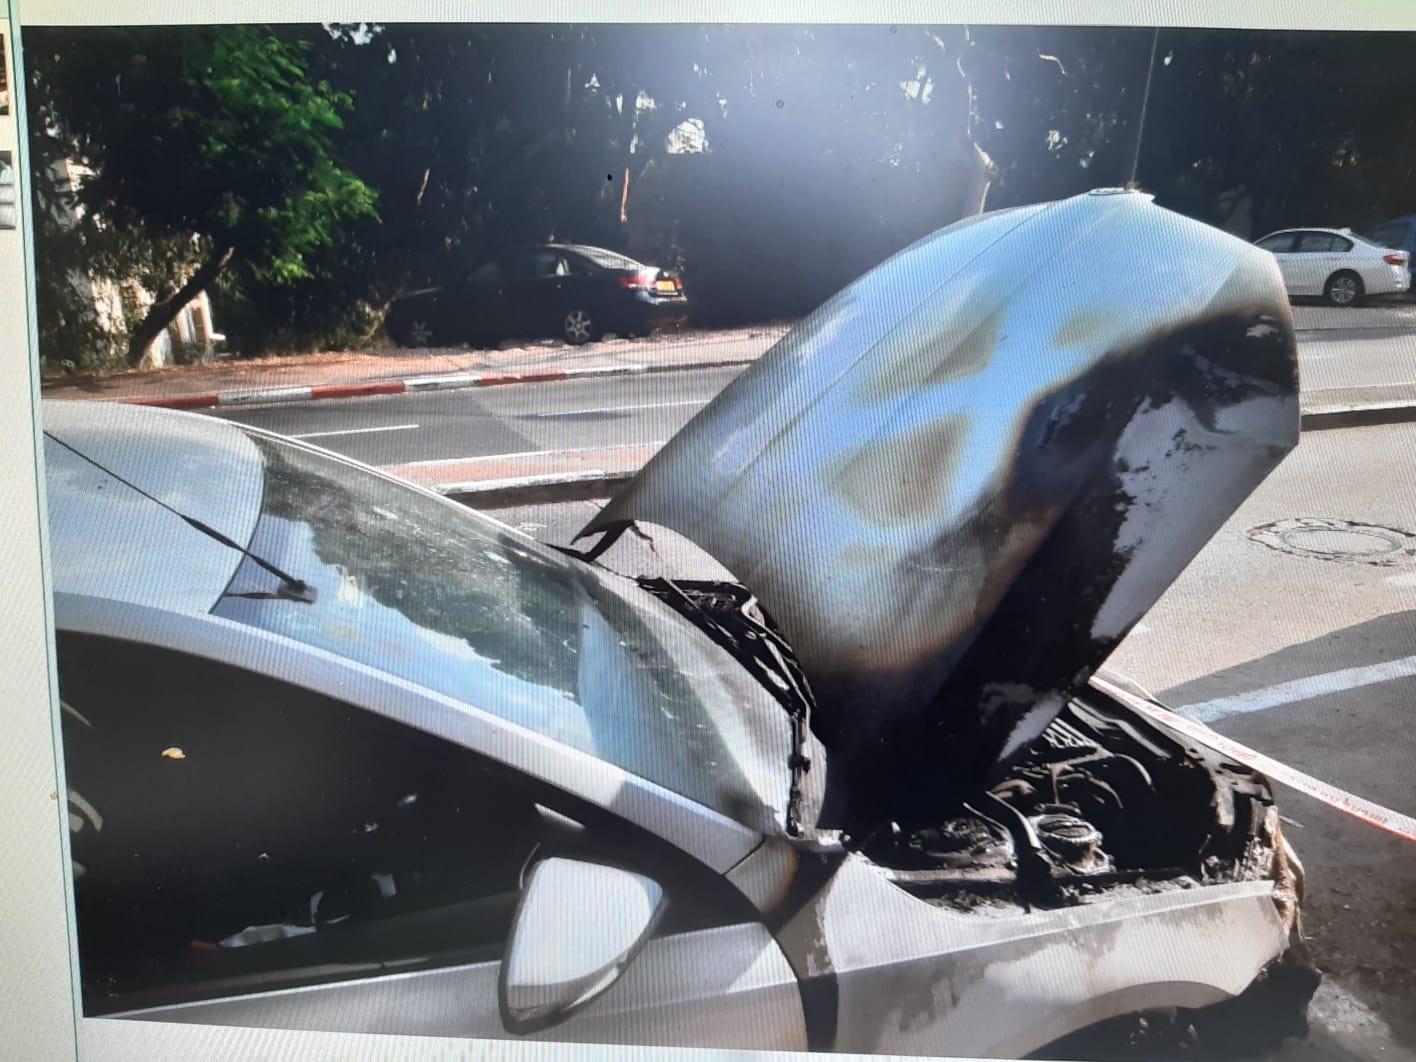 حيفا: اندلاع نيران بسيارات والشبهات تشير إلى اضرام نار متعمد